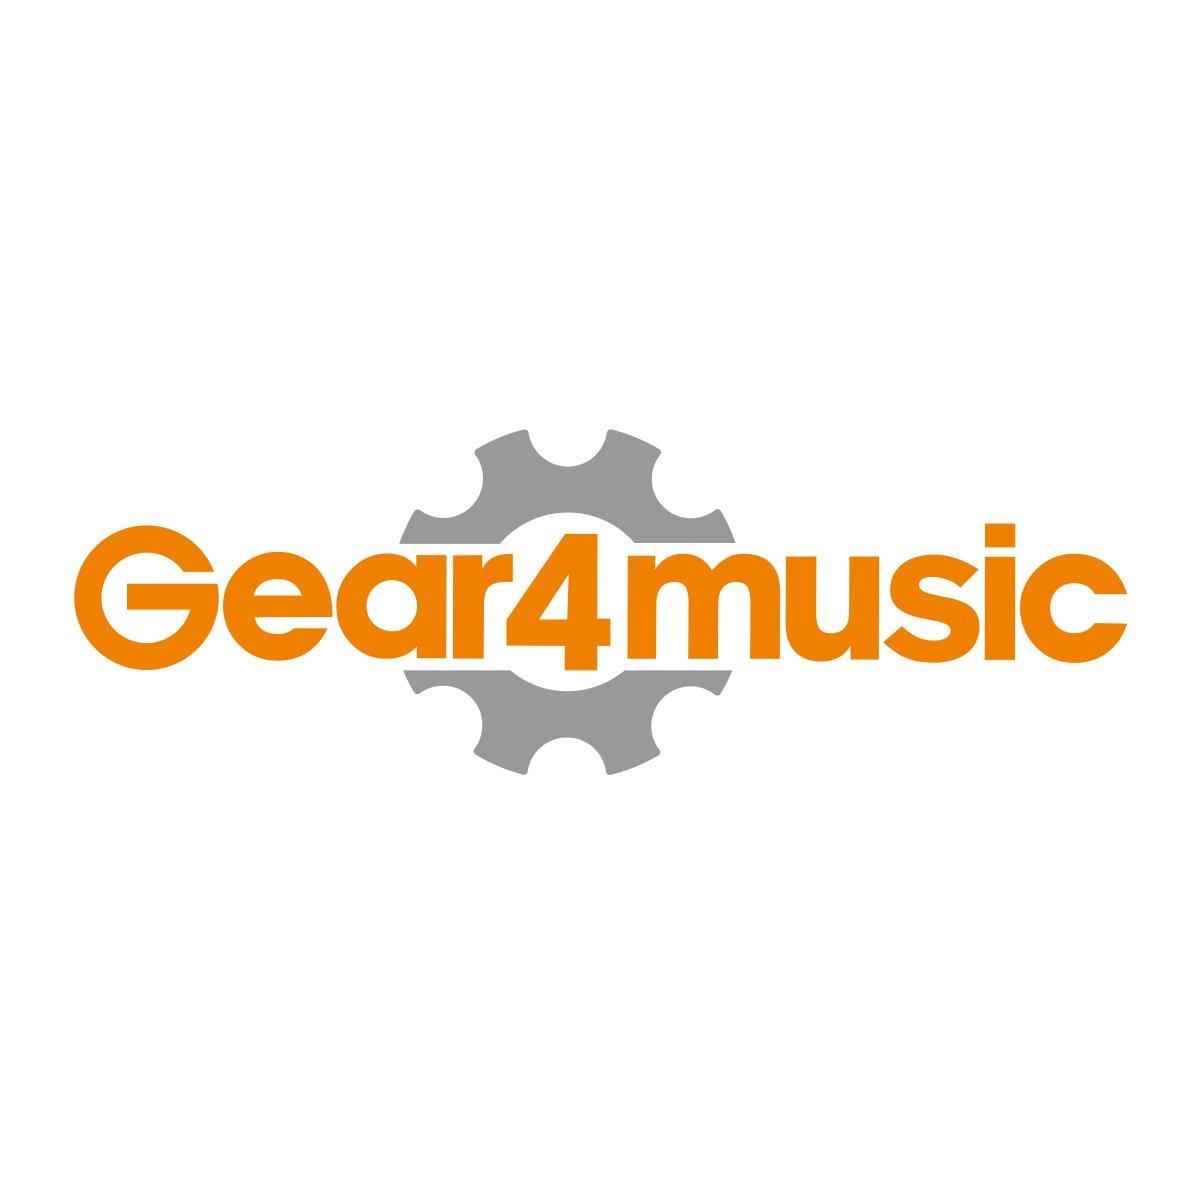 Marvelous Studio Equipment Recording Gear4Music Largest Home Design Picture Inspirations Pitcheantrous